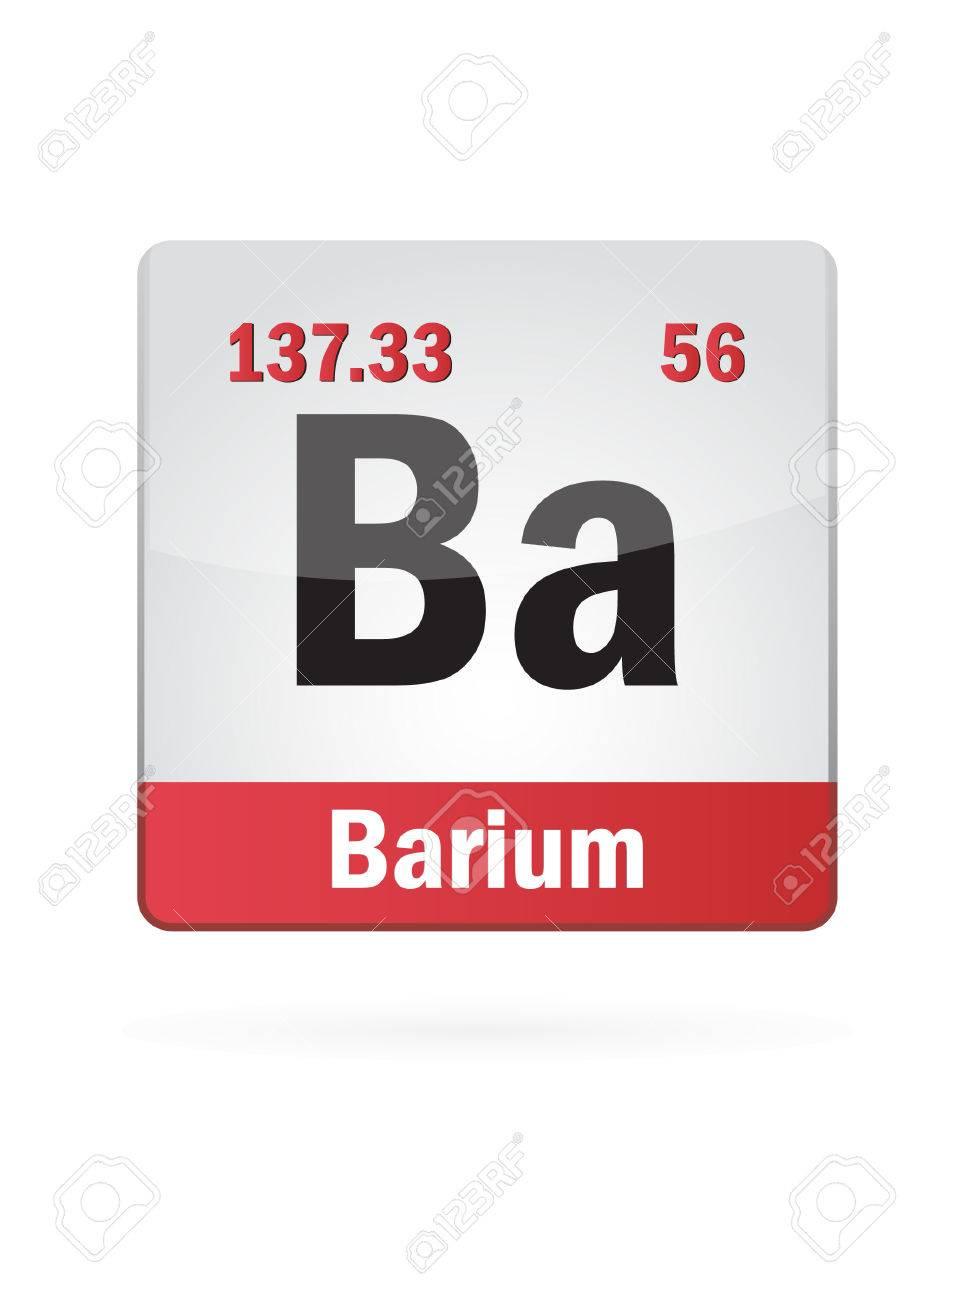 Barium symbol illustration icon on white royalty free cliparts barium symbol illustration icon on white stock vector 23075234 biocorpaavc Images